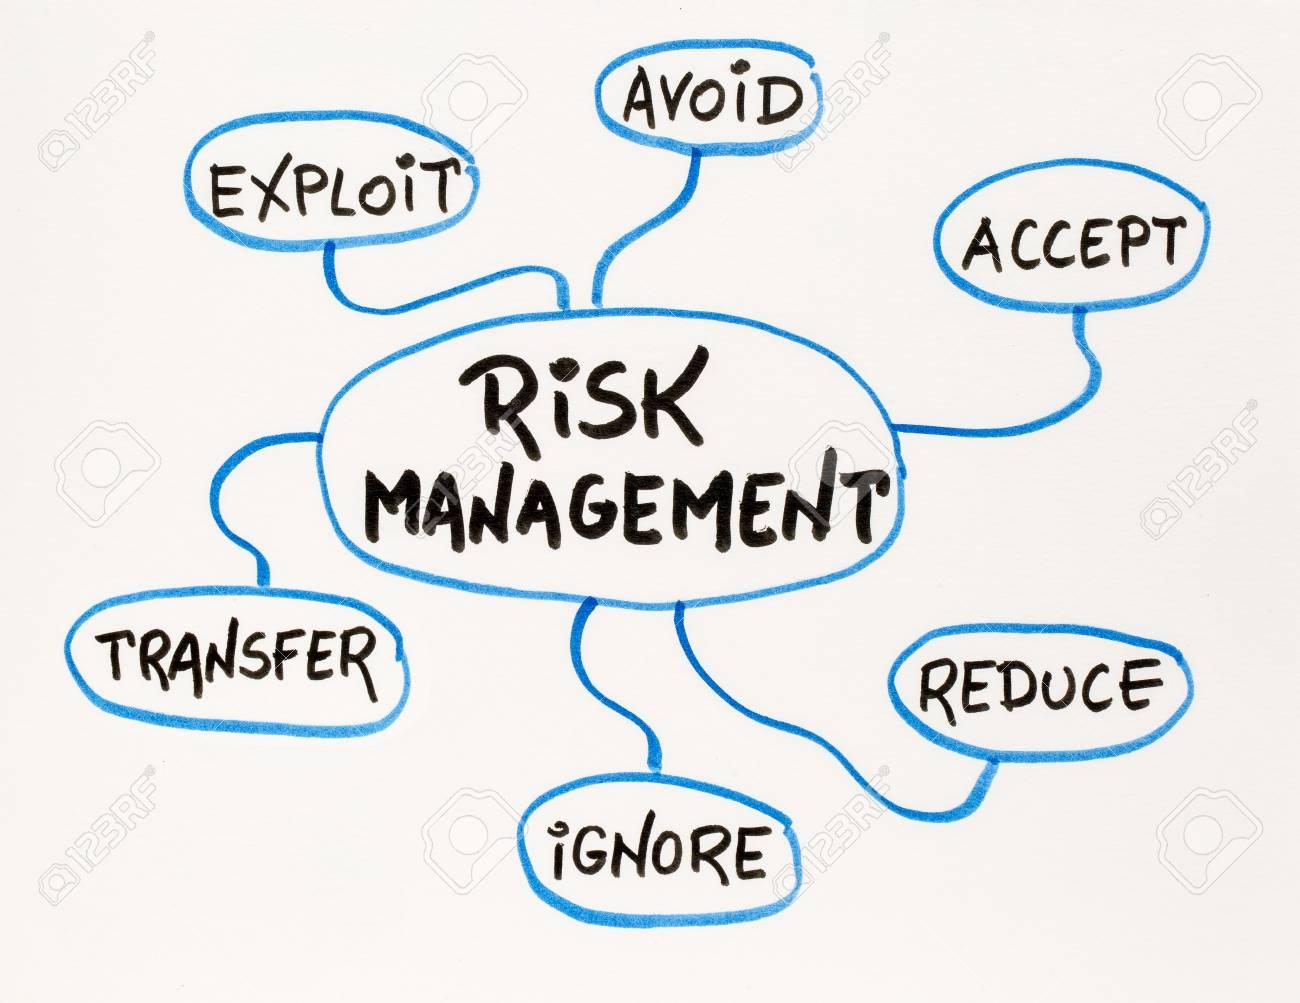 Risk management flow chart or mind map a sketch on a matting risk management flow chart or mind map a sketch on a matting board stock photo nvjuhfo Images